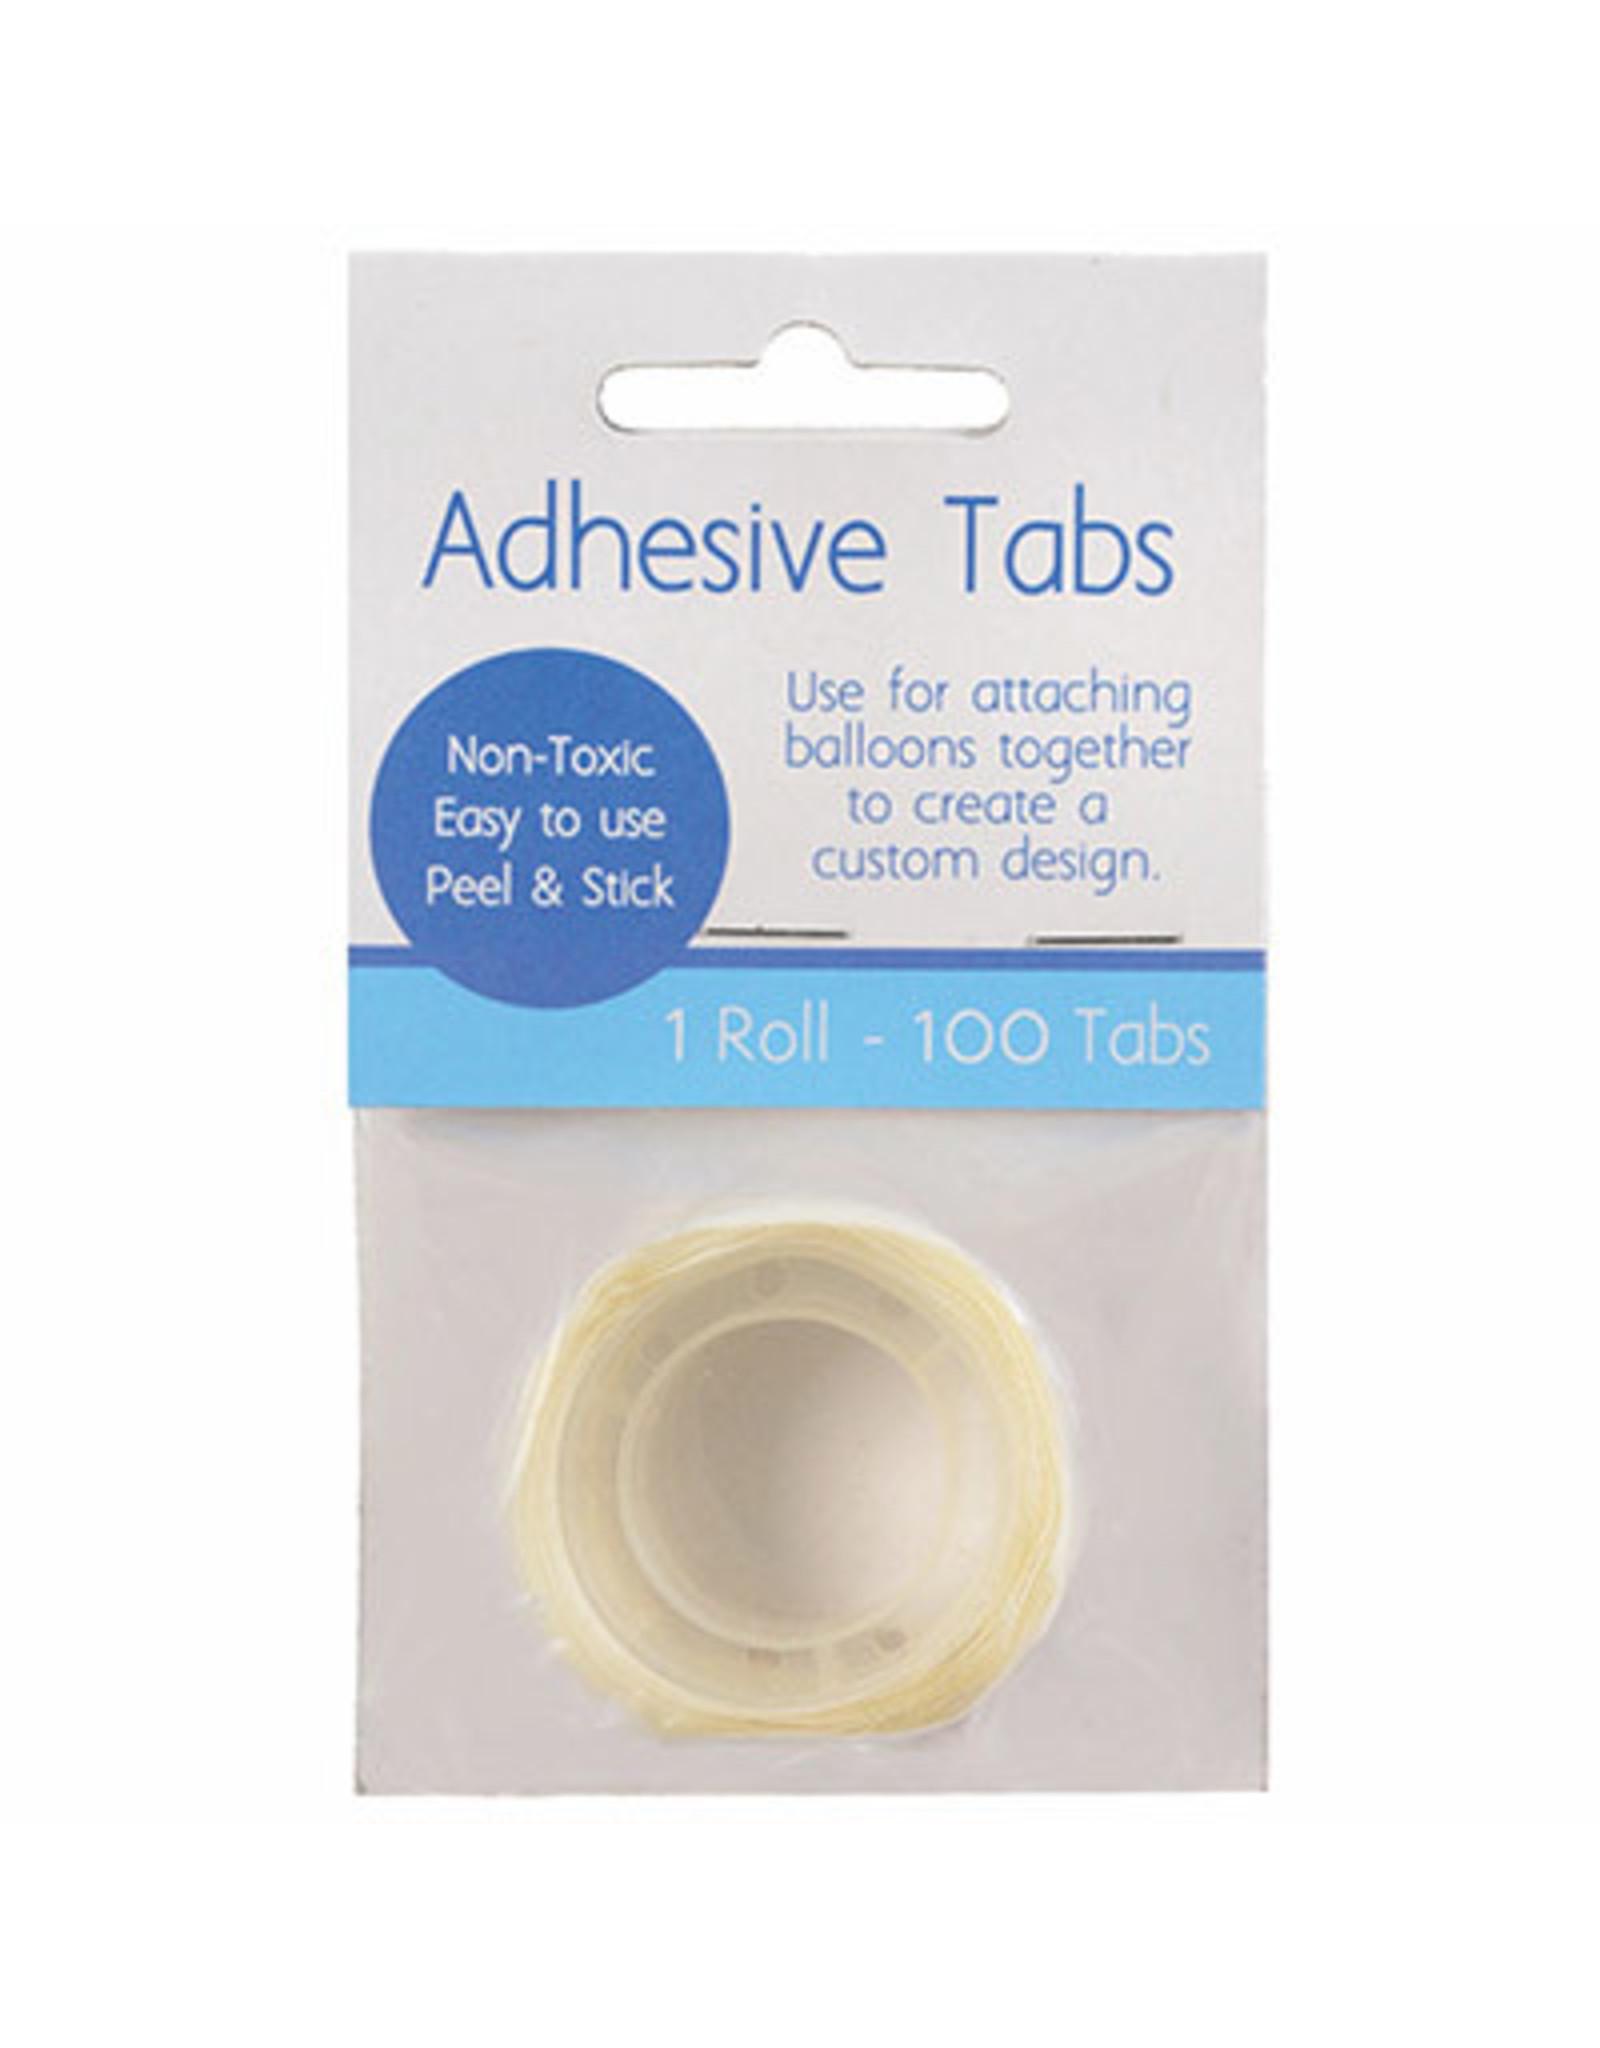 Amscan Adhesive Balloon Tabs - 100ct.